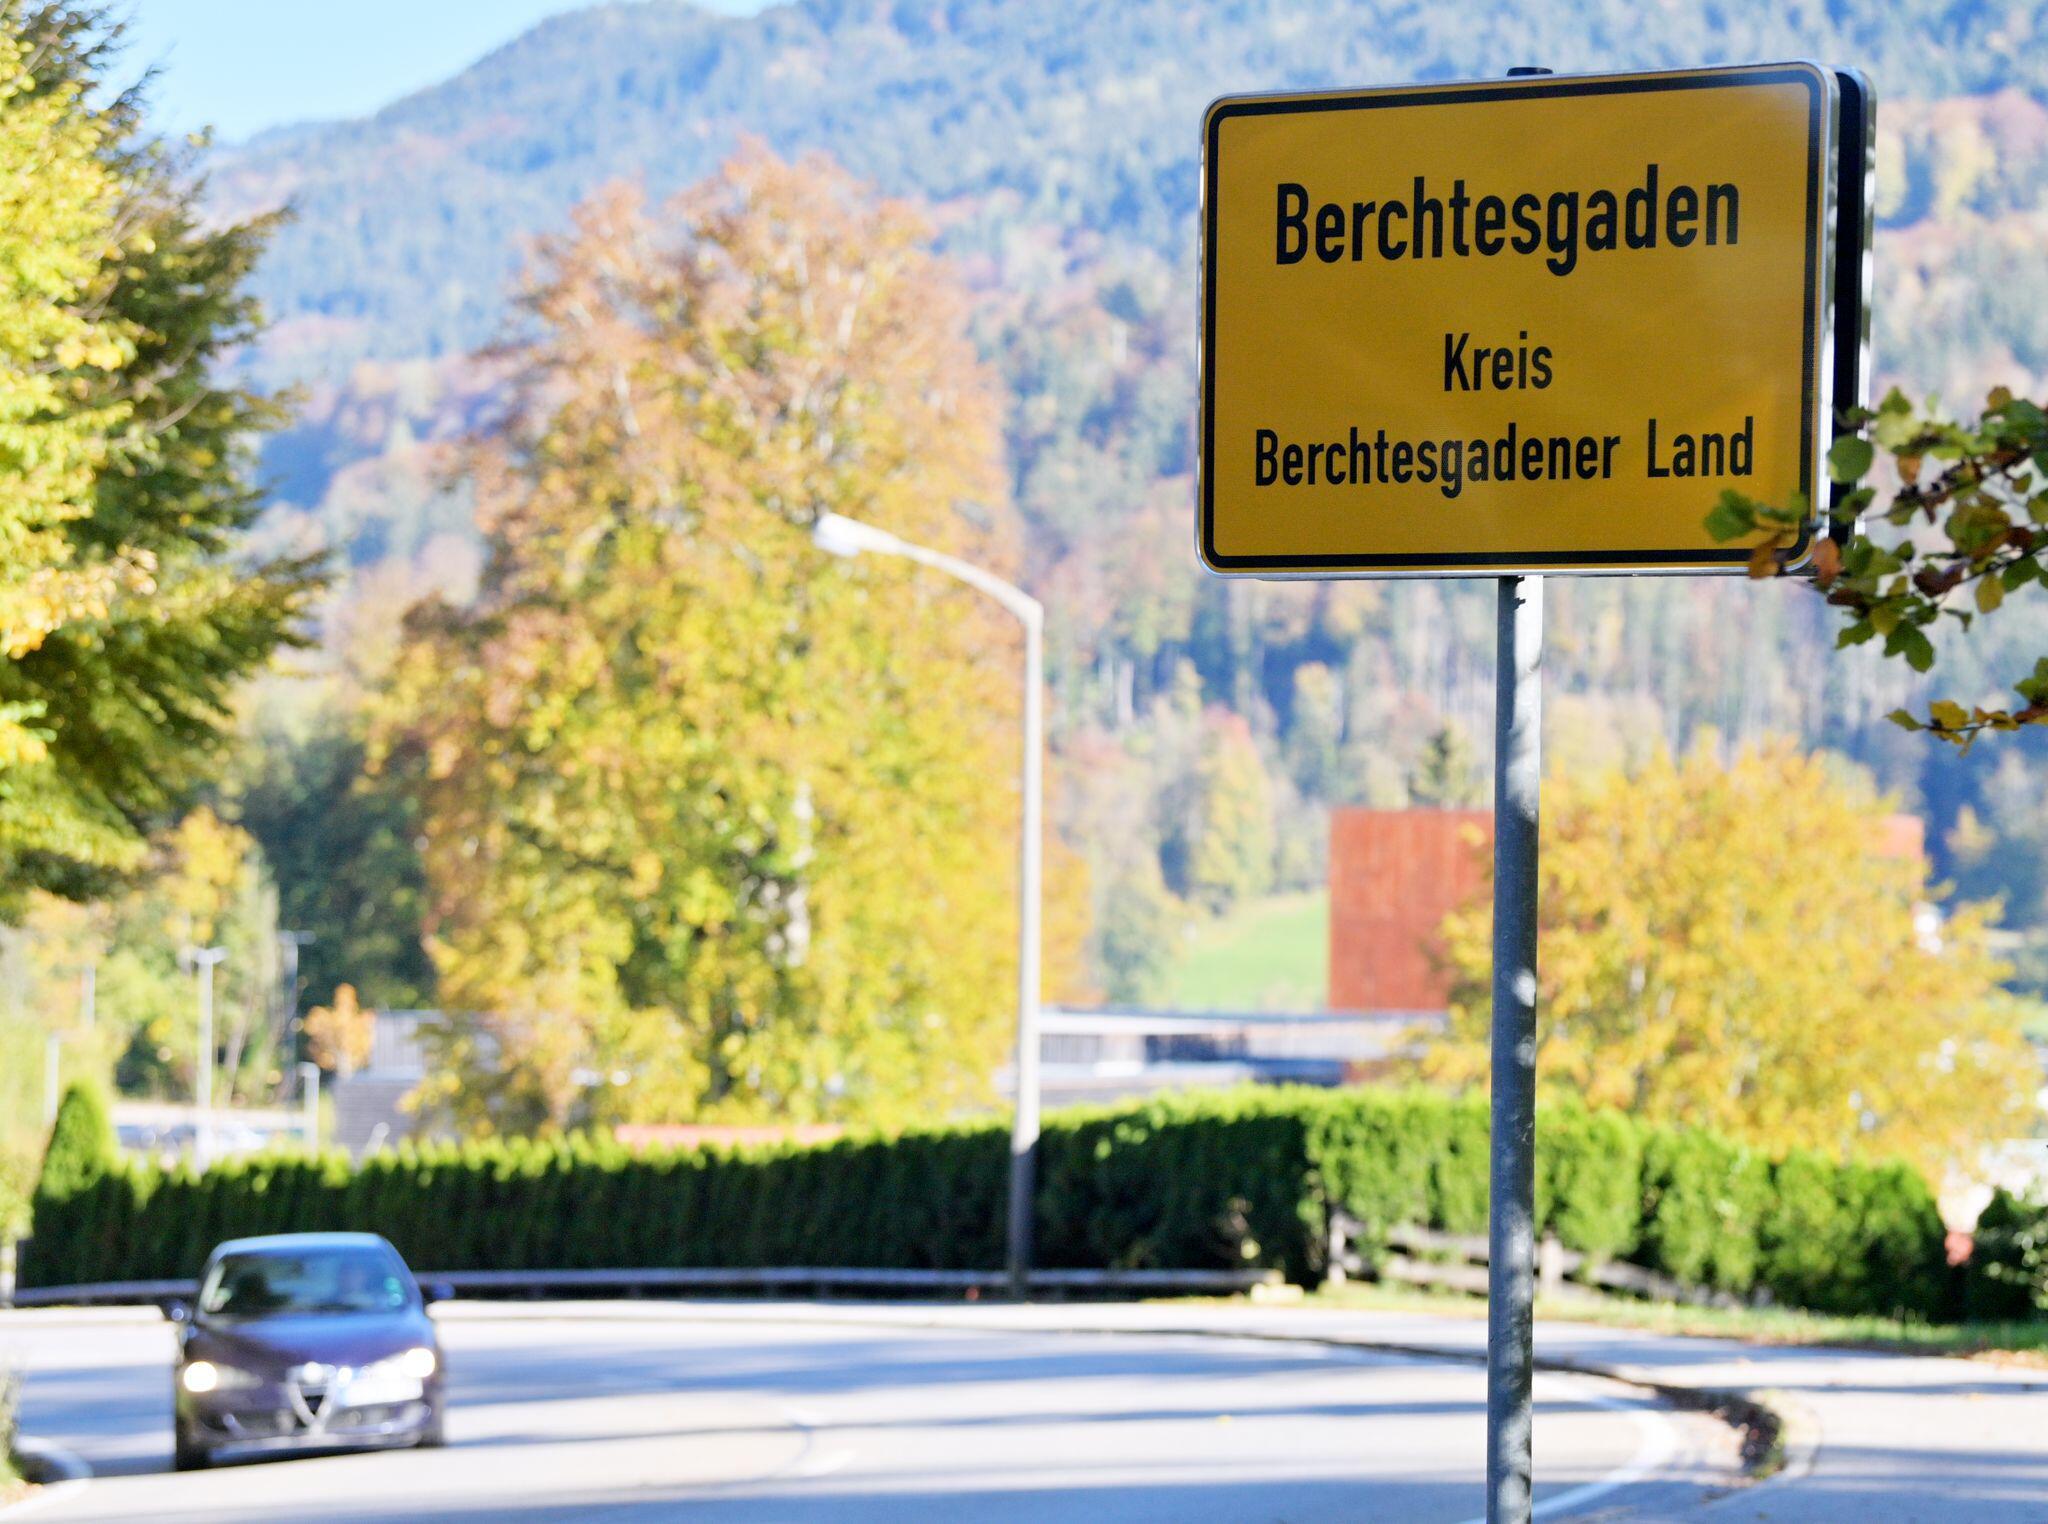 Ausgangsbeschränkungen und geschlossene Schulen: Berchtesgadener Land verhängt Lockdown